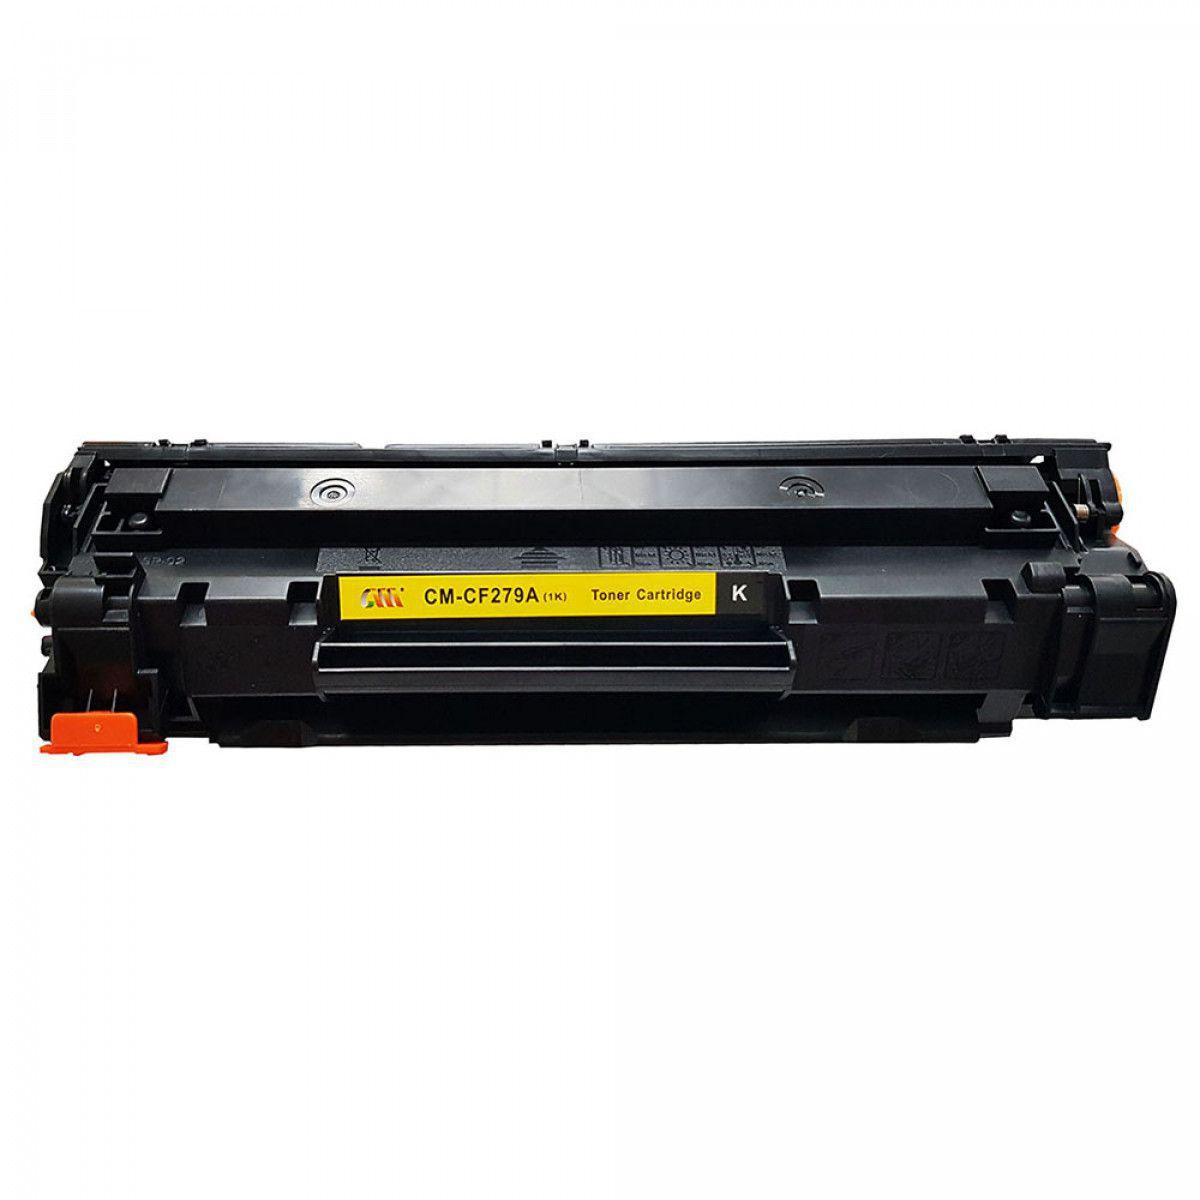 Toner Cf279a Cf279 279 Laserjet Pro M12 M12a M12w M26nw m26